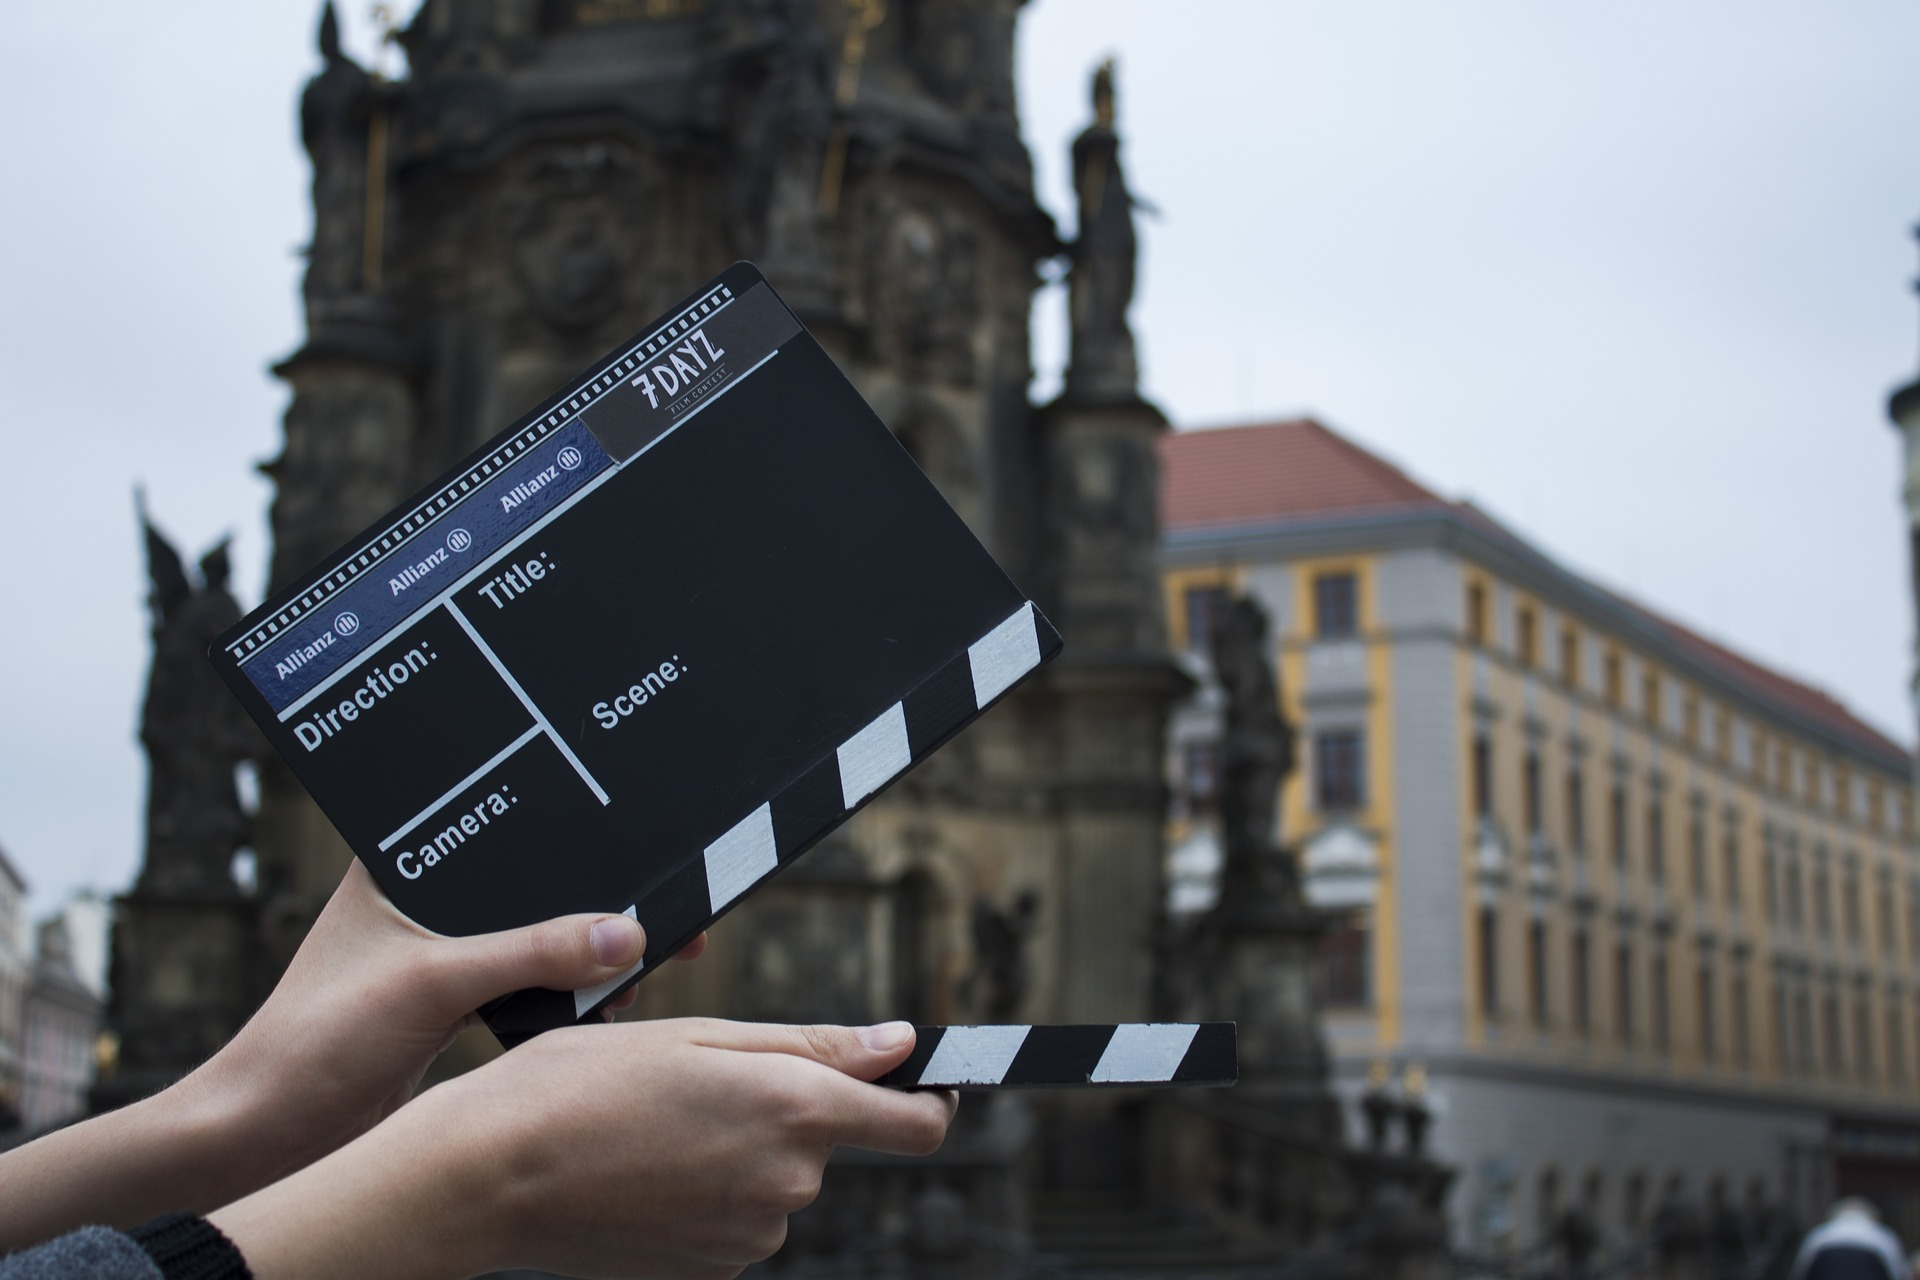 8ukraїnśkyh kinokartyn vysunuť na«Oskar»